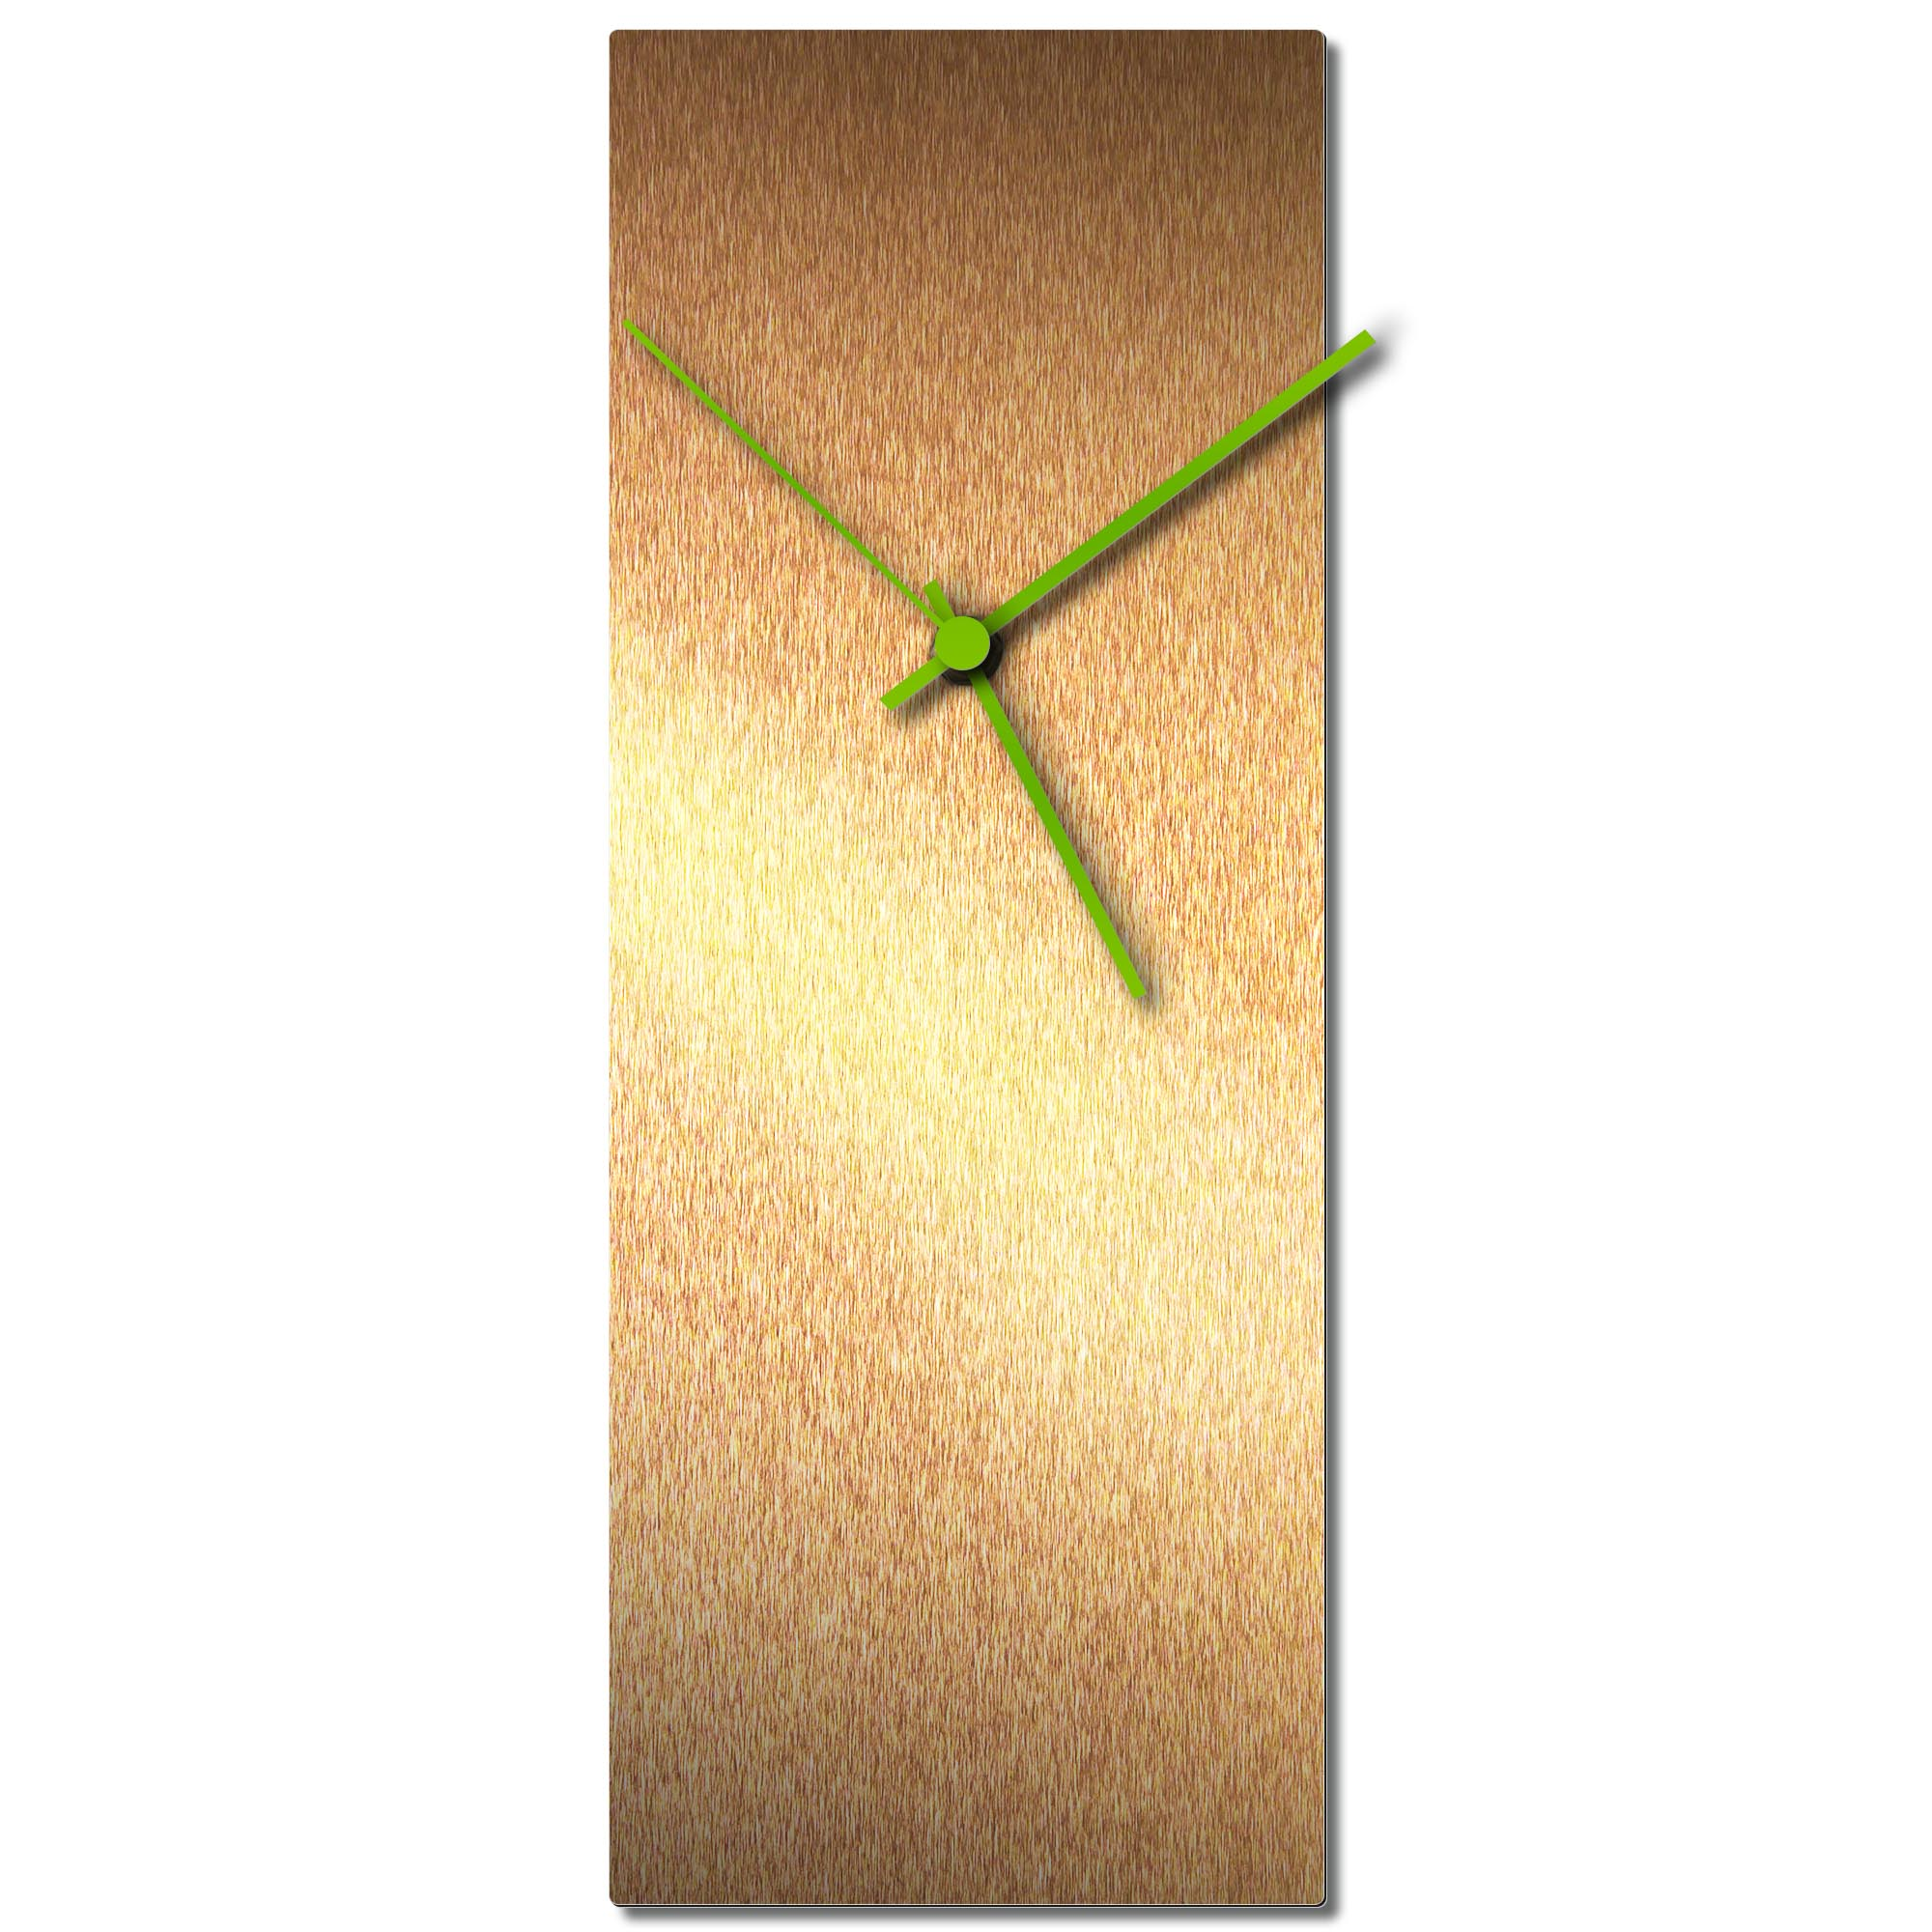 Adam Schwoeppe 'Bronzesmith Clock Green' Midcentury Modern Style Wall Clock